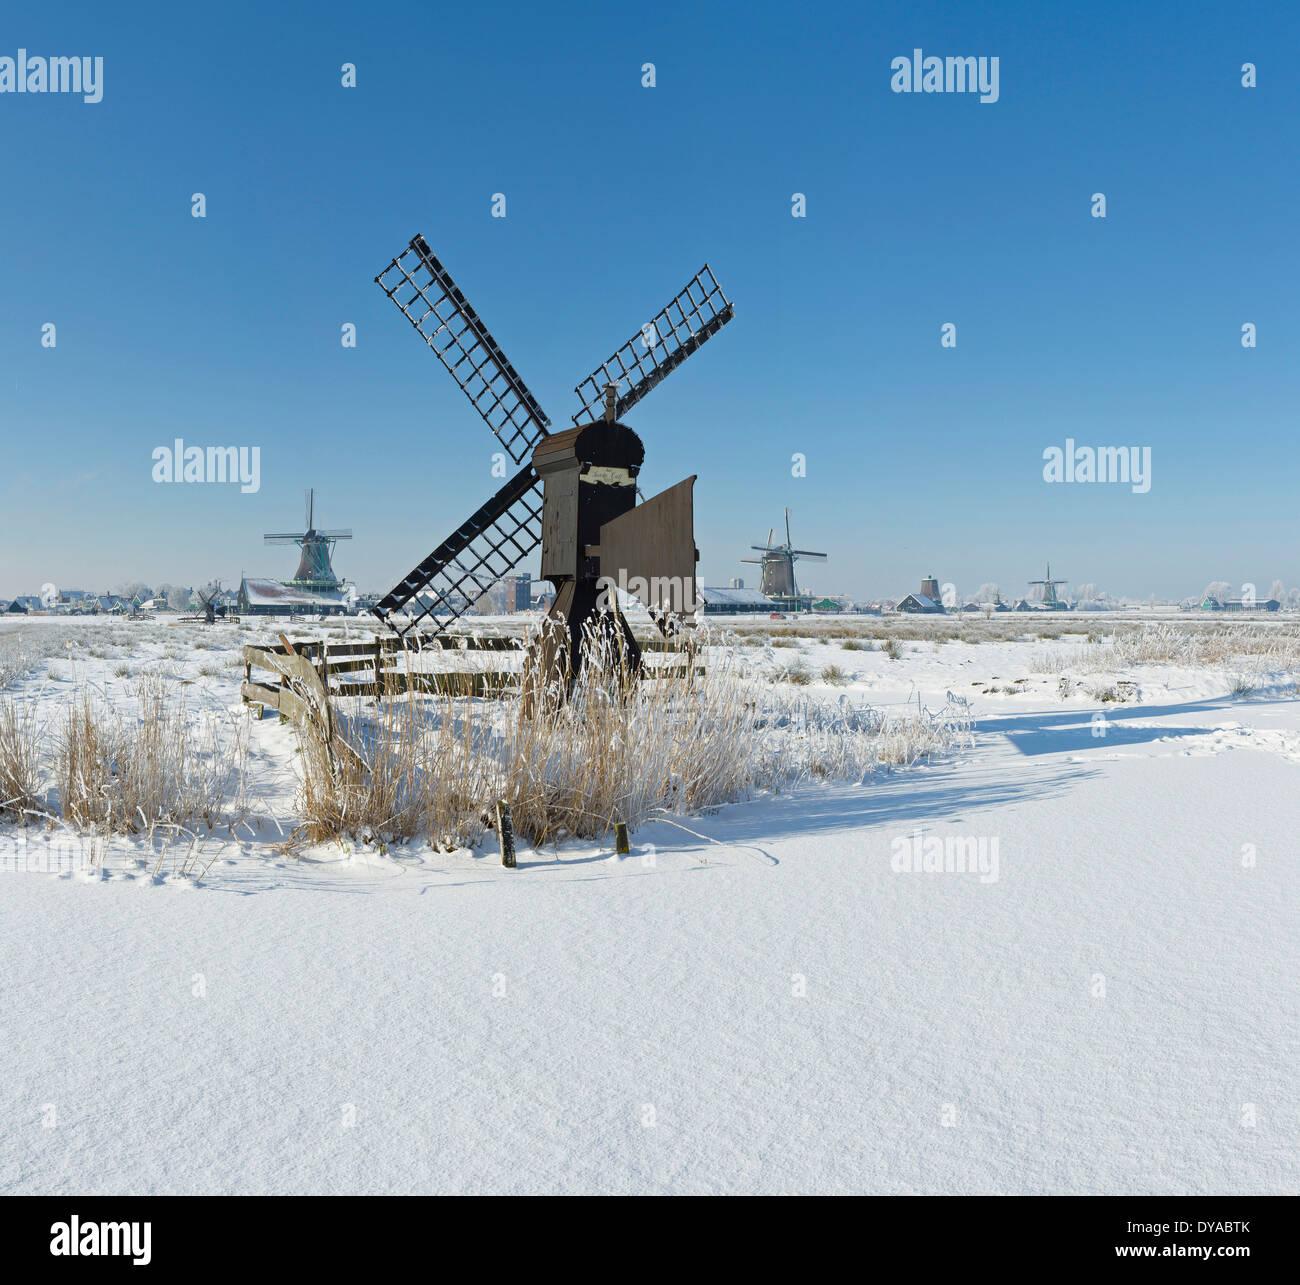 Netherlands, Holland, Europe, Zaandam, North Holland, windmill, field, meadow, winter, snow, ice, Windmills - Stock Image